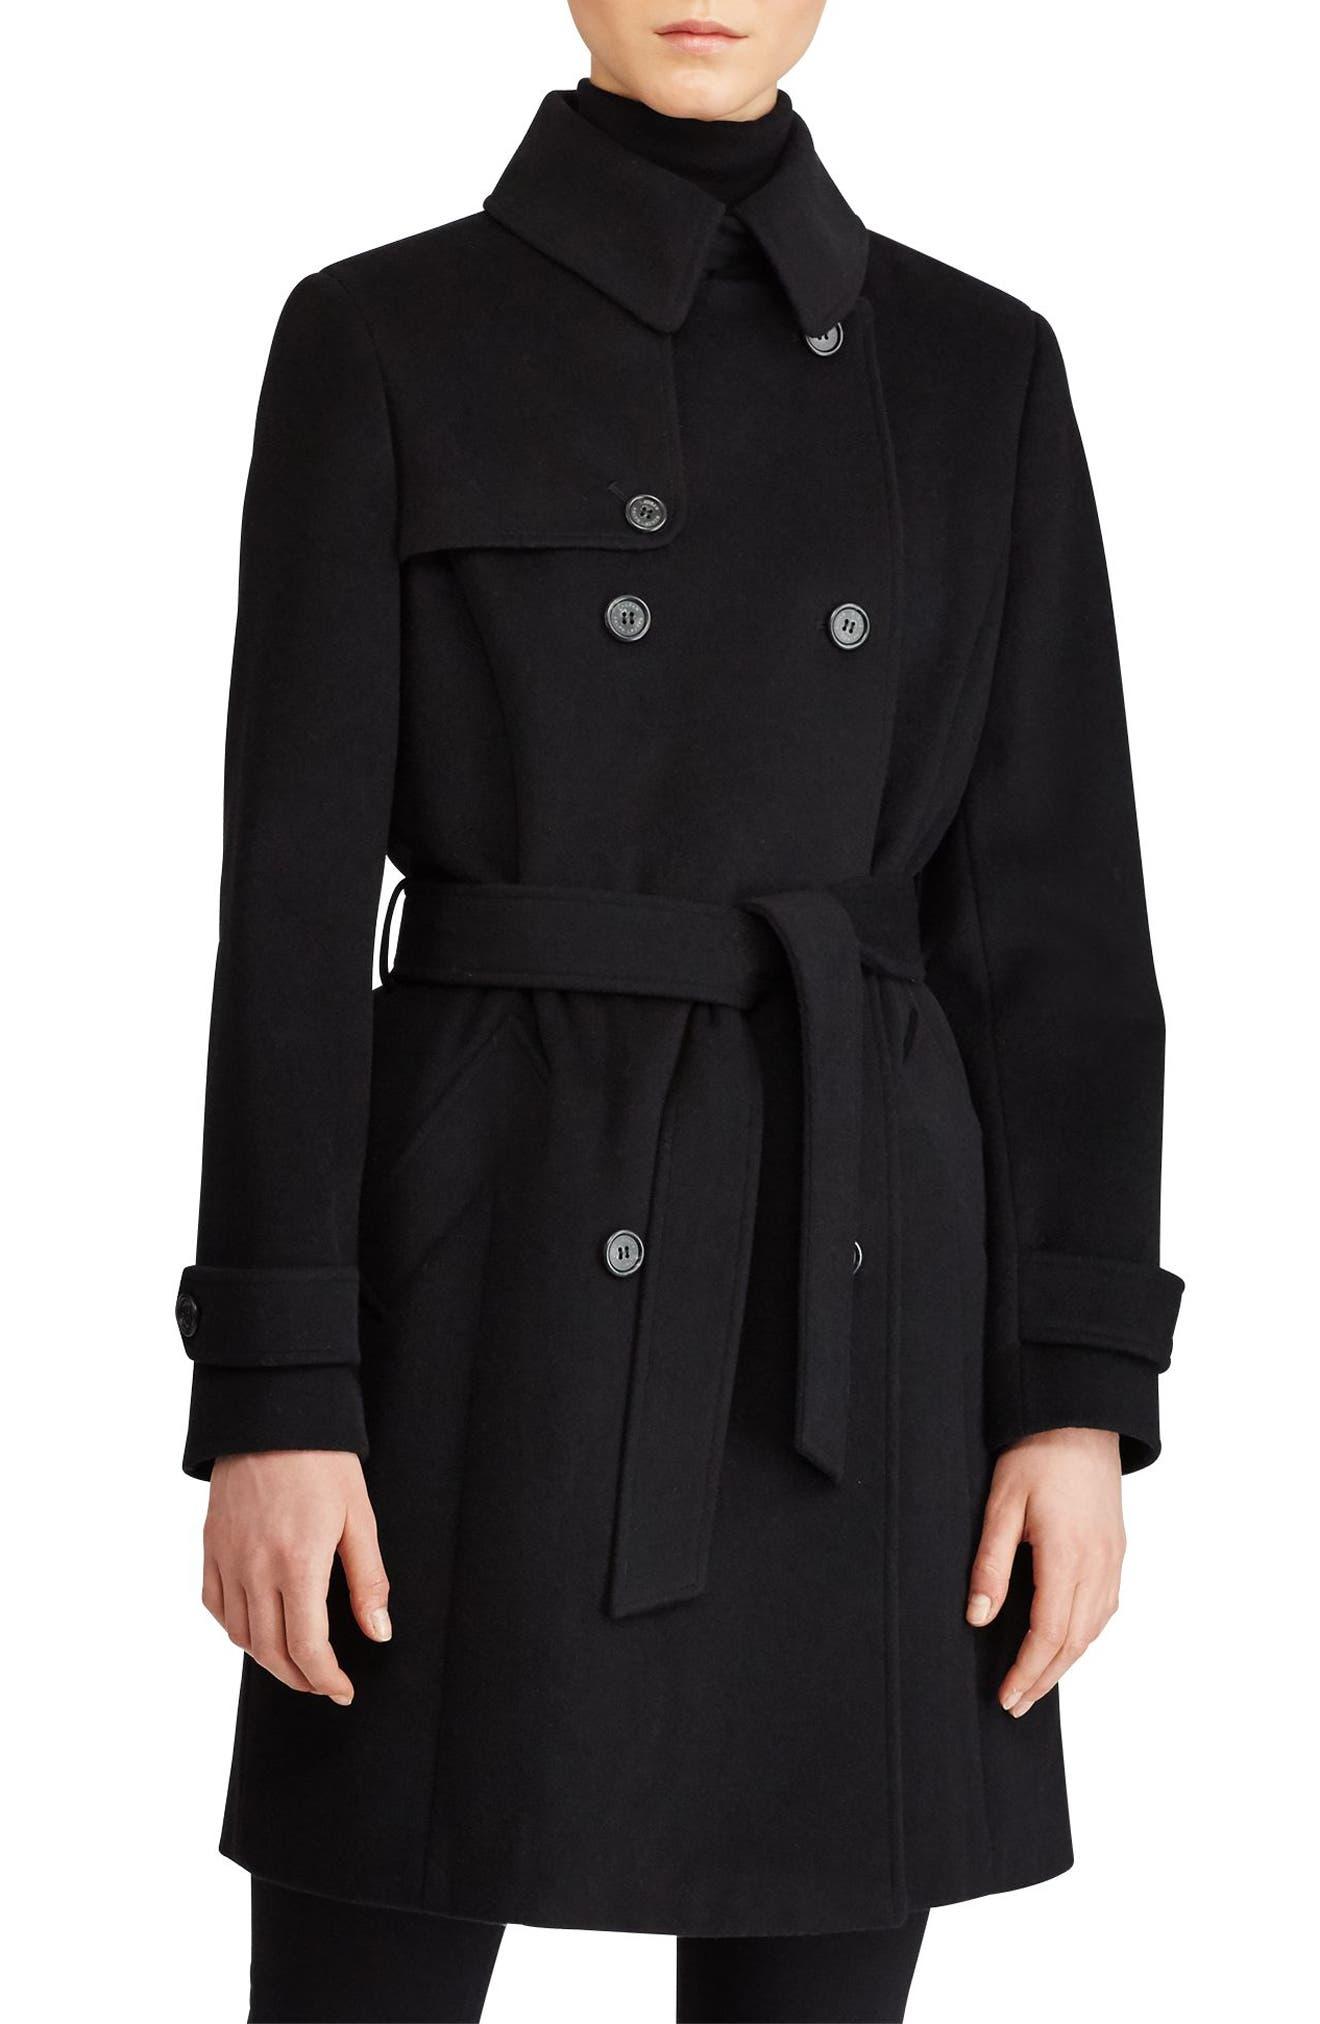 Wool Blend Trench Coat,                             Main thumbnail 1, color,                             Black